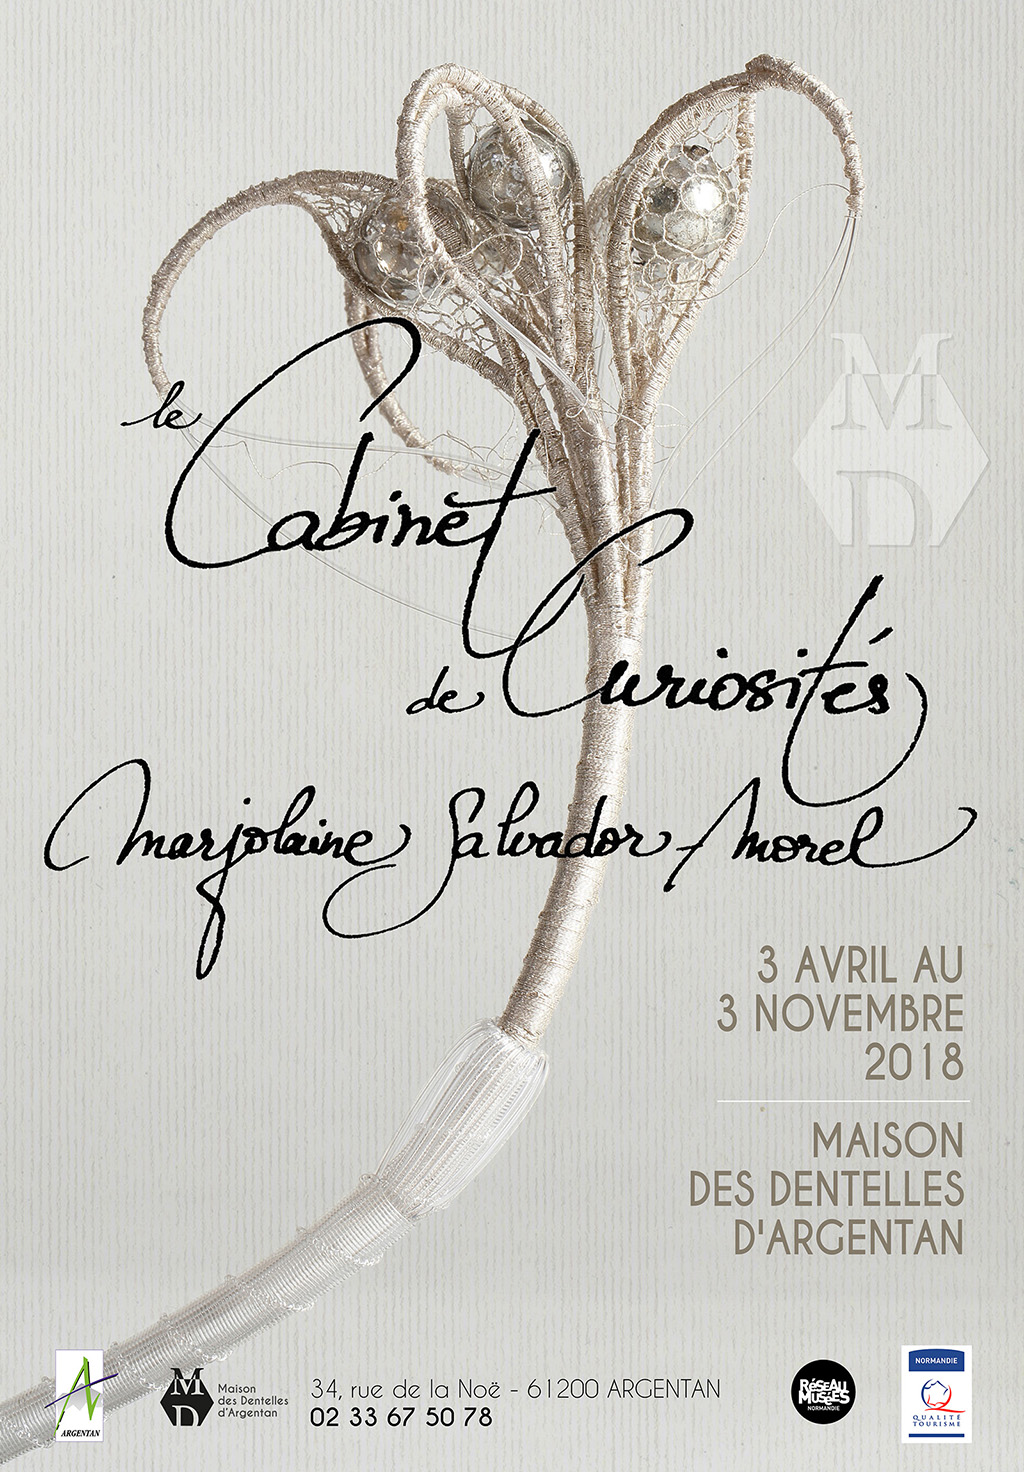 Le Cabinet de Curiosités de Marjolaine Salvador-Morel